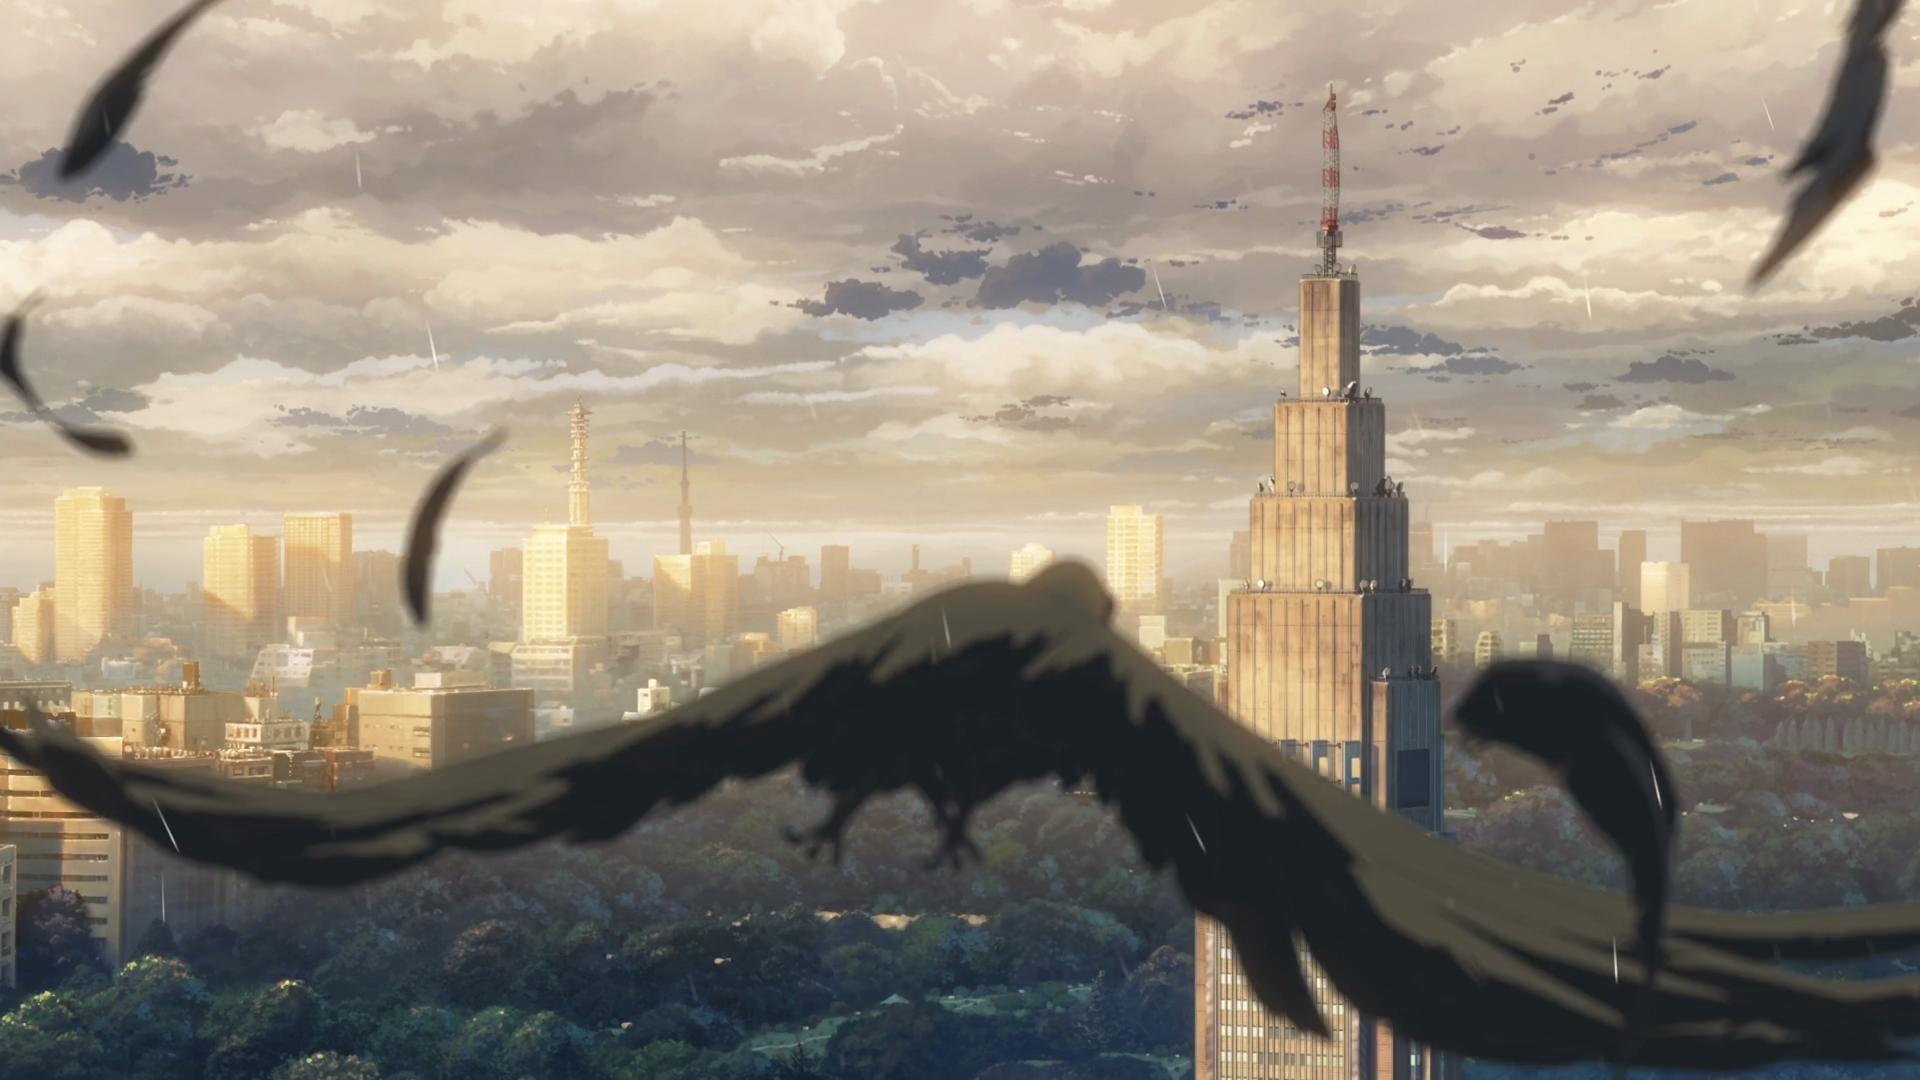 Wallpapers :: Makoto Shinkai, artwork, anime, The Garden of Words